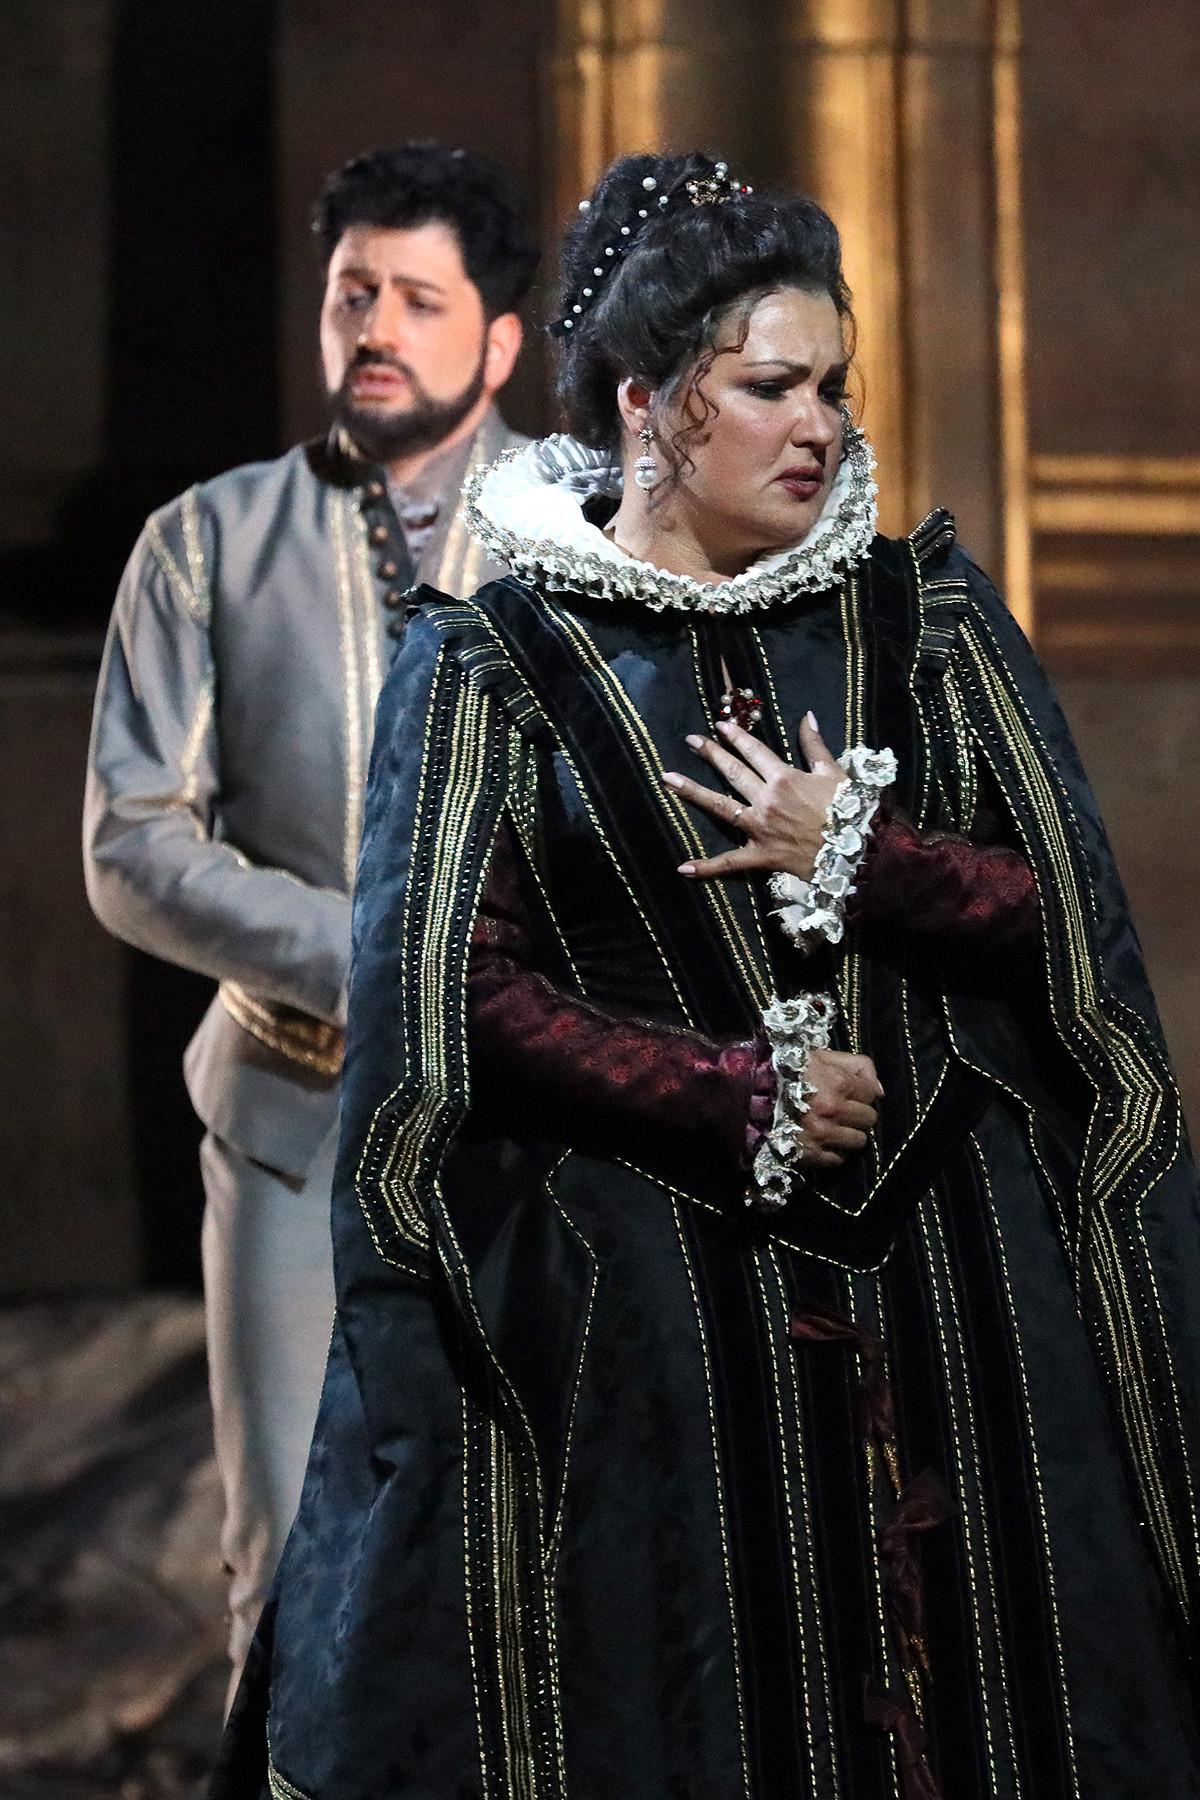 Anna Netrebko e Ioussef Eivazov na ópera 'Don Carlo'. Damir Yusupov/bolshoi.ru